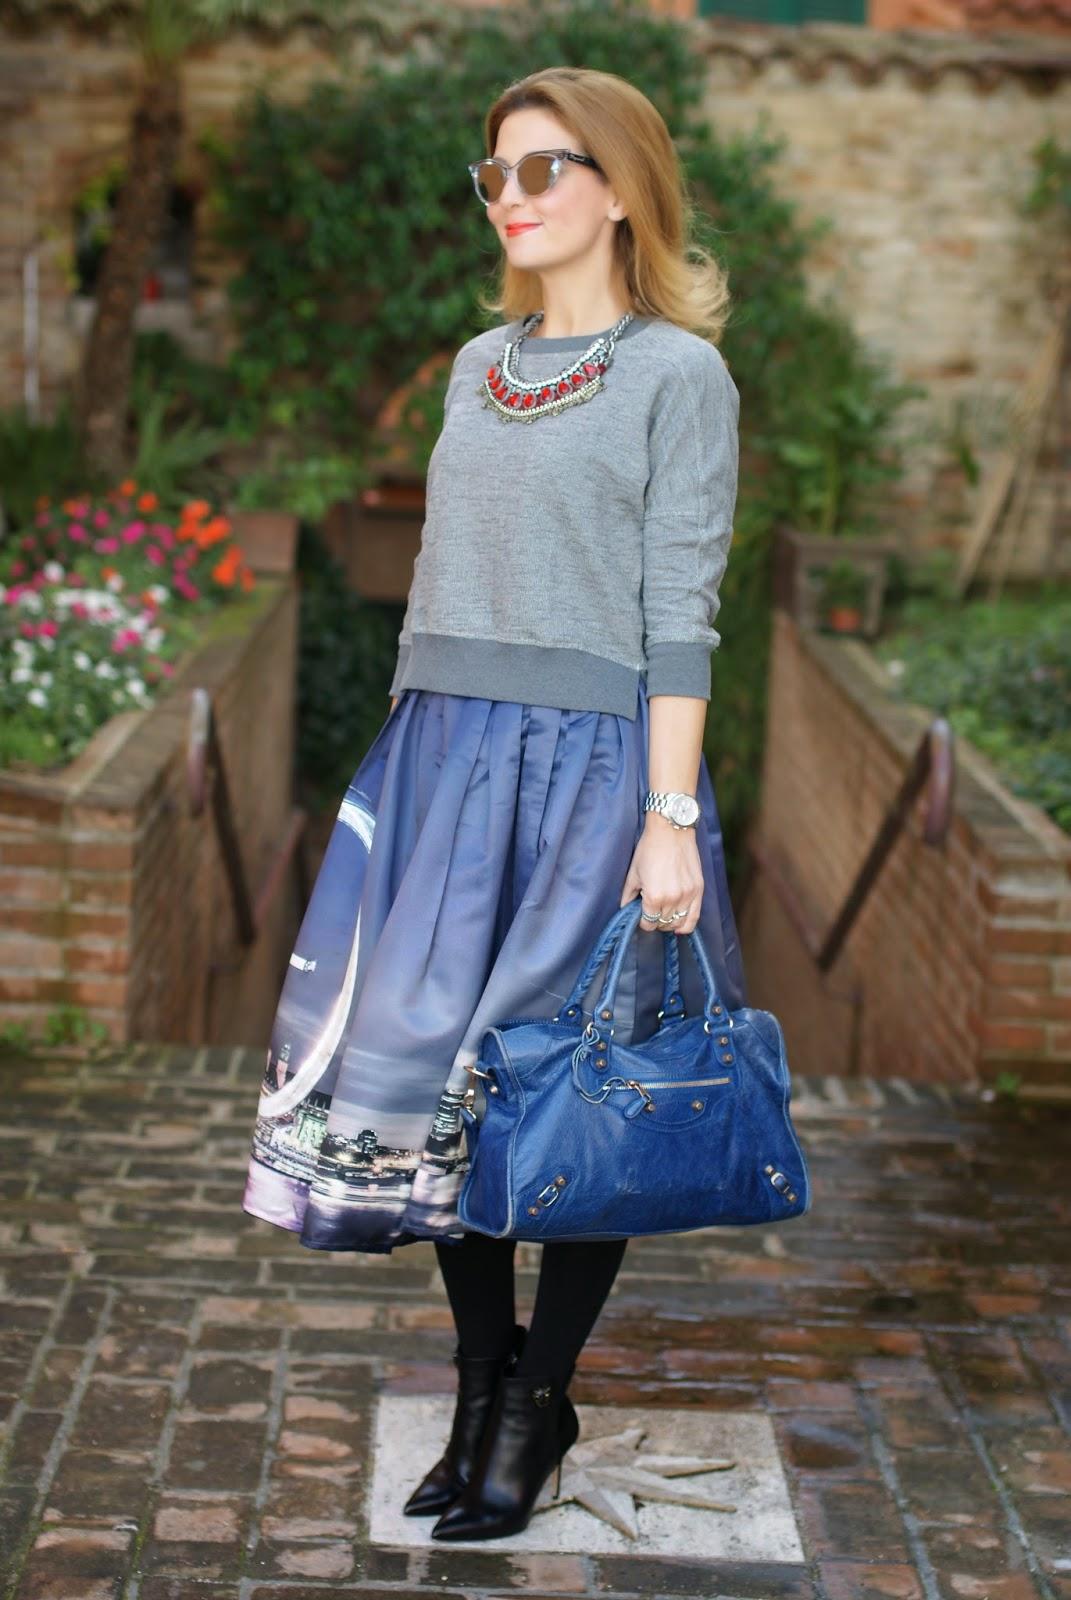 Chicwish London Skyline print, London Eye print midi skirt, Le Silla shoes, Fashion and Cookies, fashion blogger